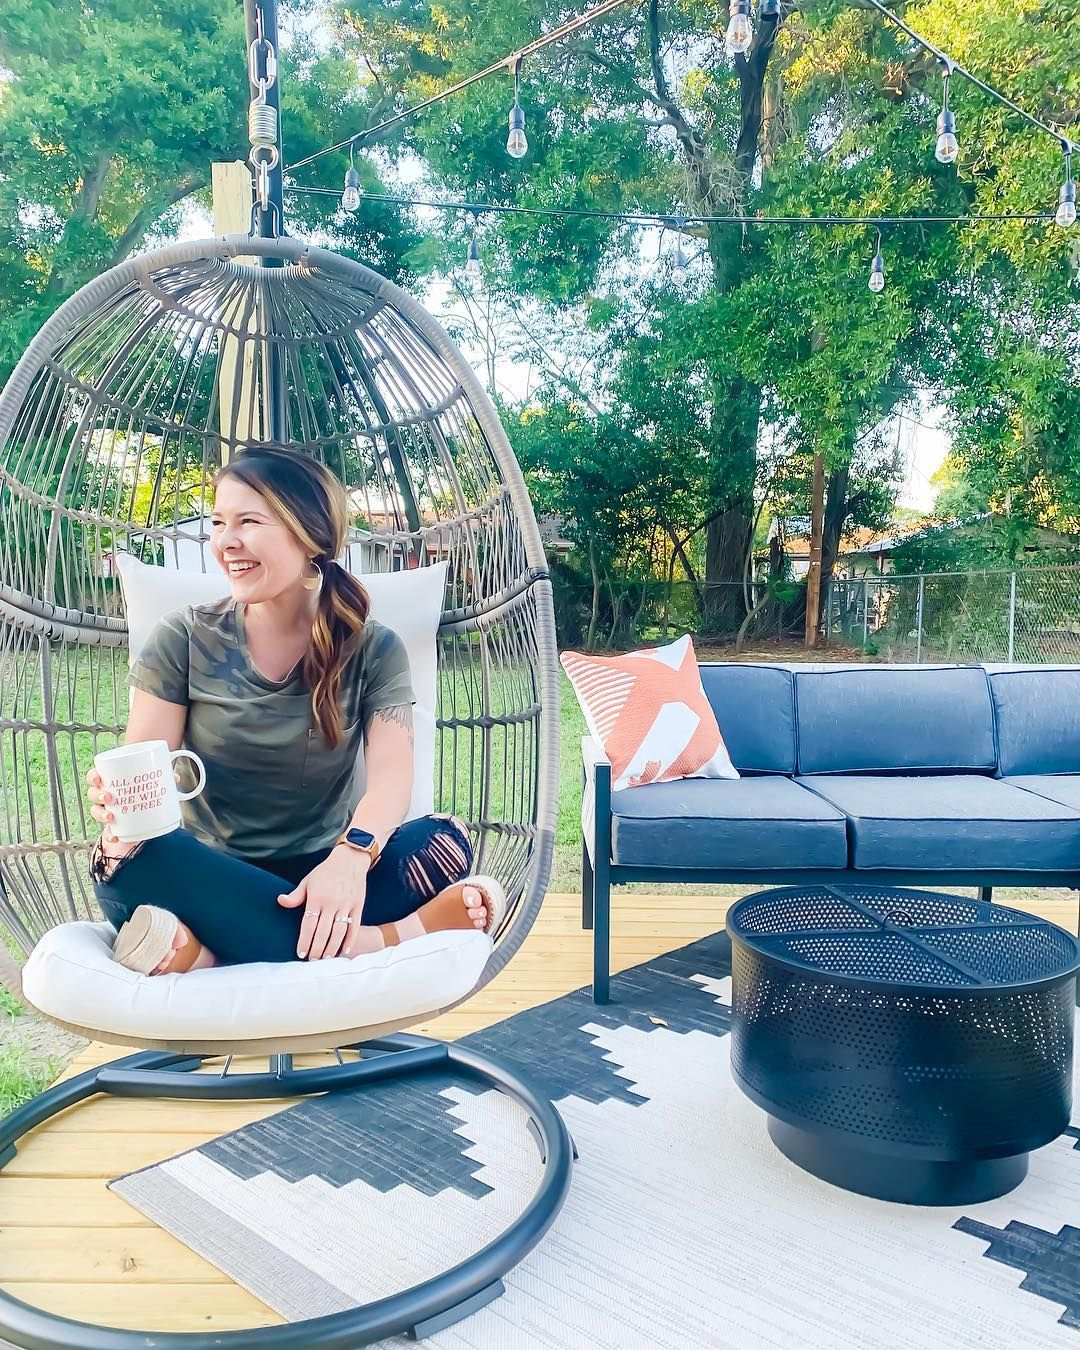 Target Egg Chair Outdoor space, Quiet time, Instagram